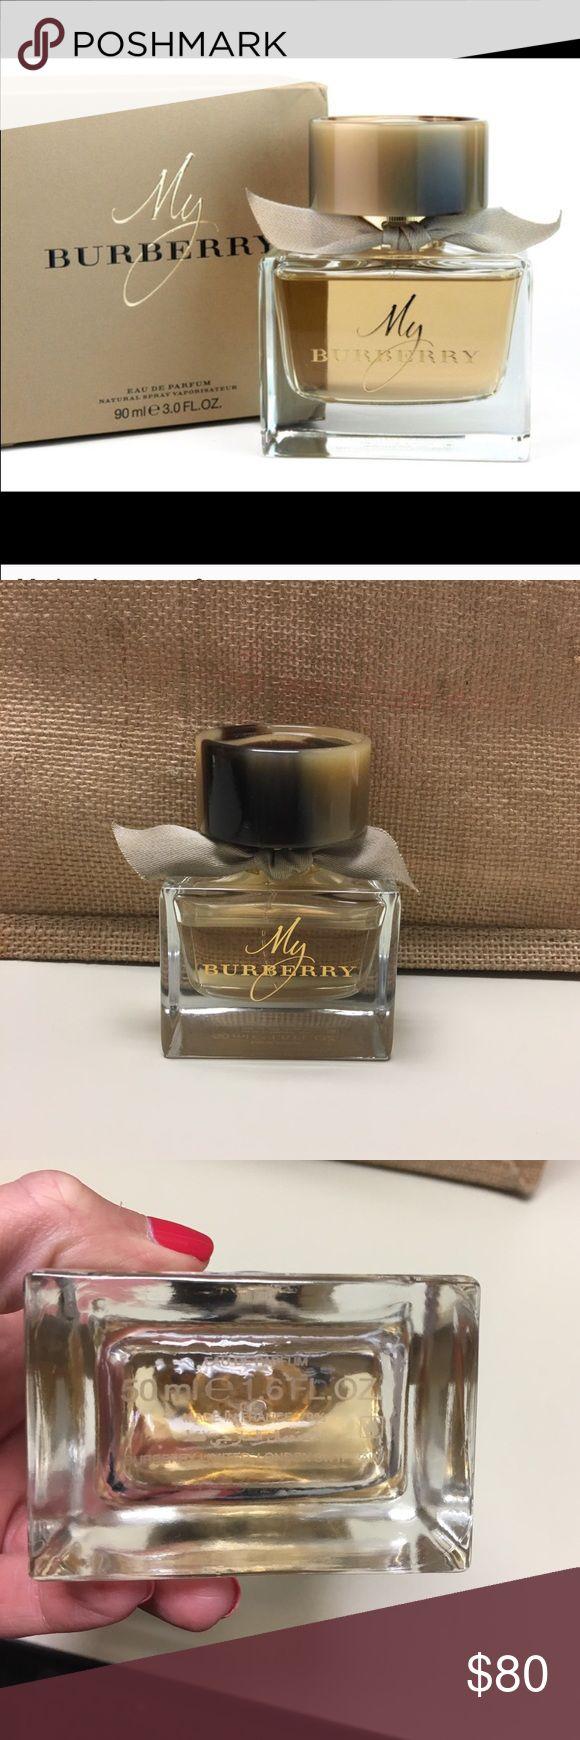 Lightly used MY Burberry perfume 1.6fl oz Lightly used MY Burberry perfume 1.6fl oz Burberry Other